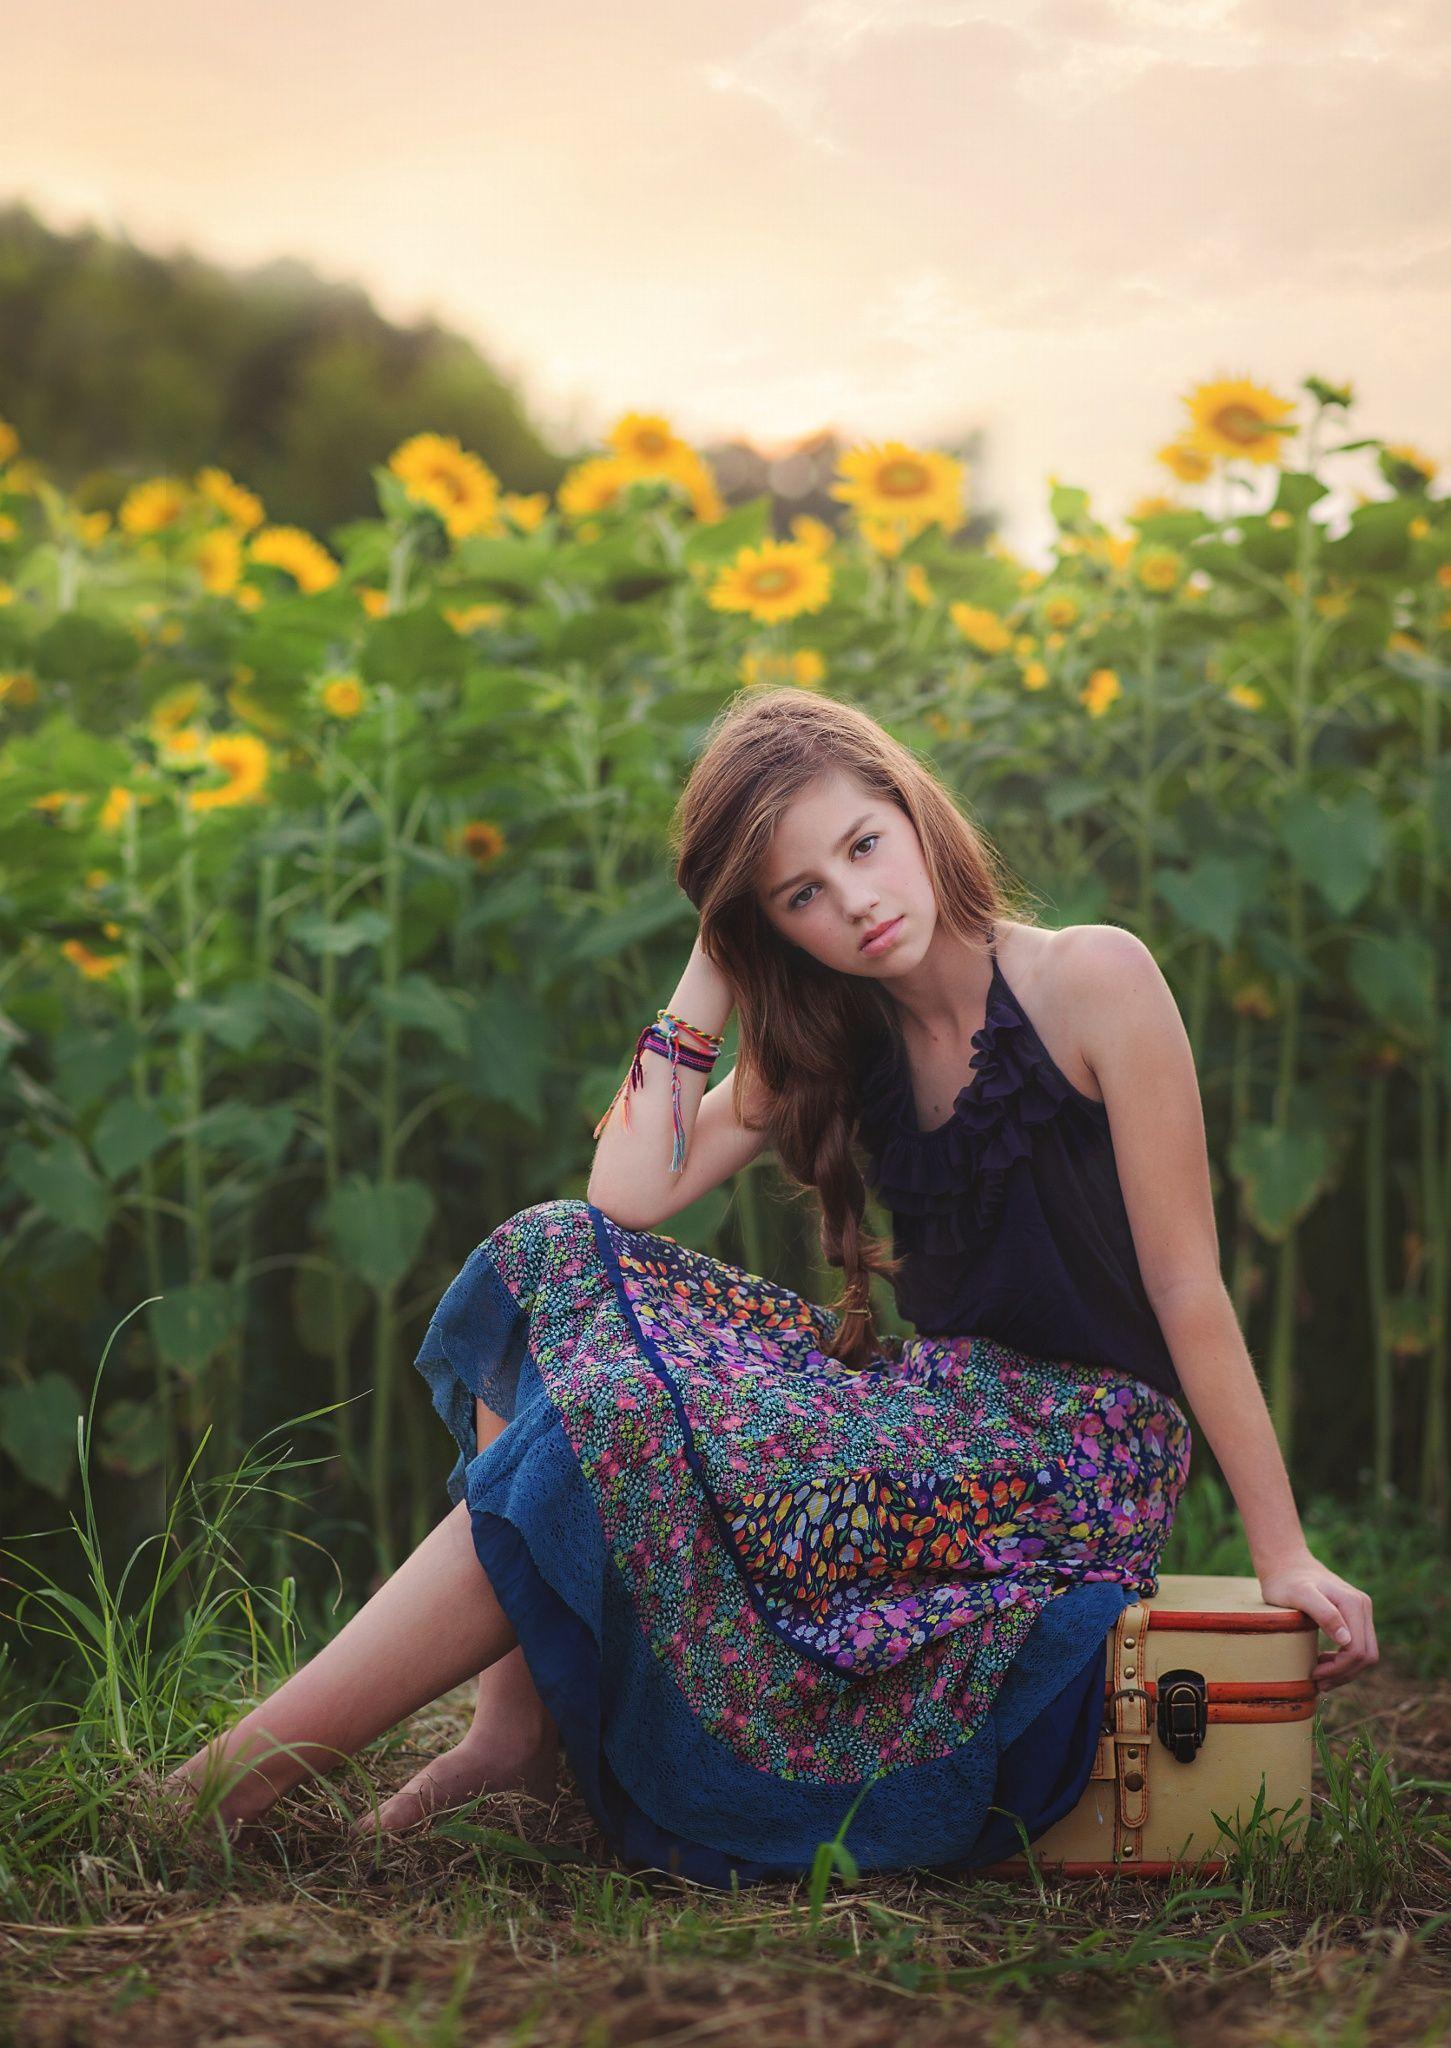 Photo Sunflower Sunset by Suzanne Corneliussen on 500px